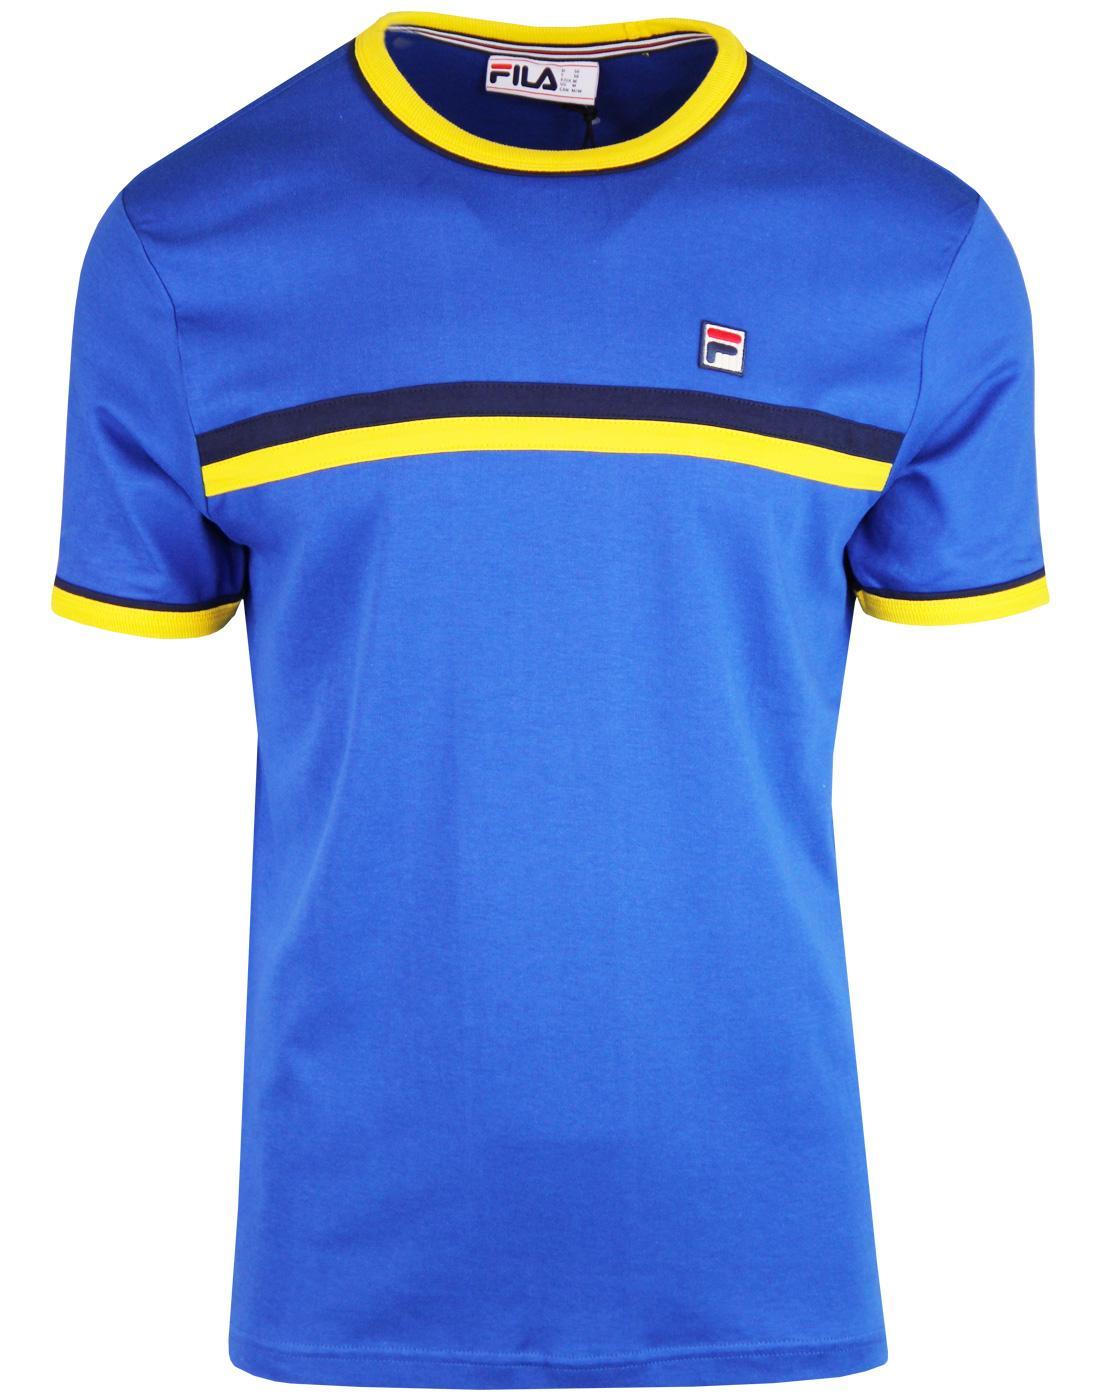 Razee FILA VINTAGE 70s Chest Stripe T-Shirt (STW)